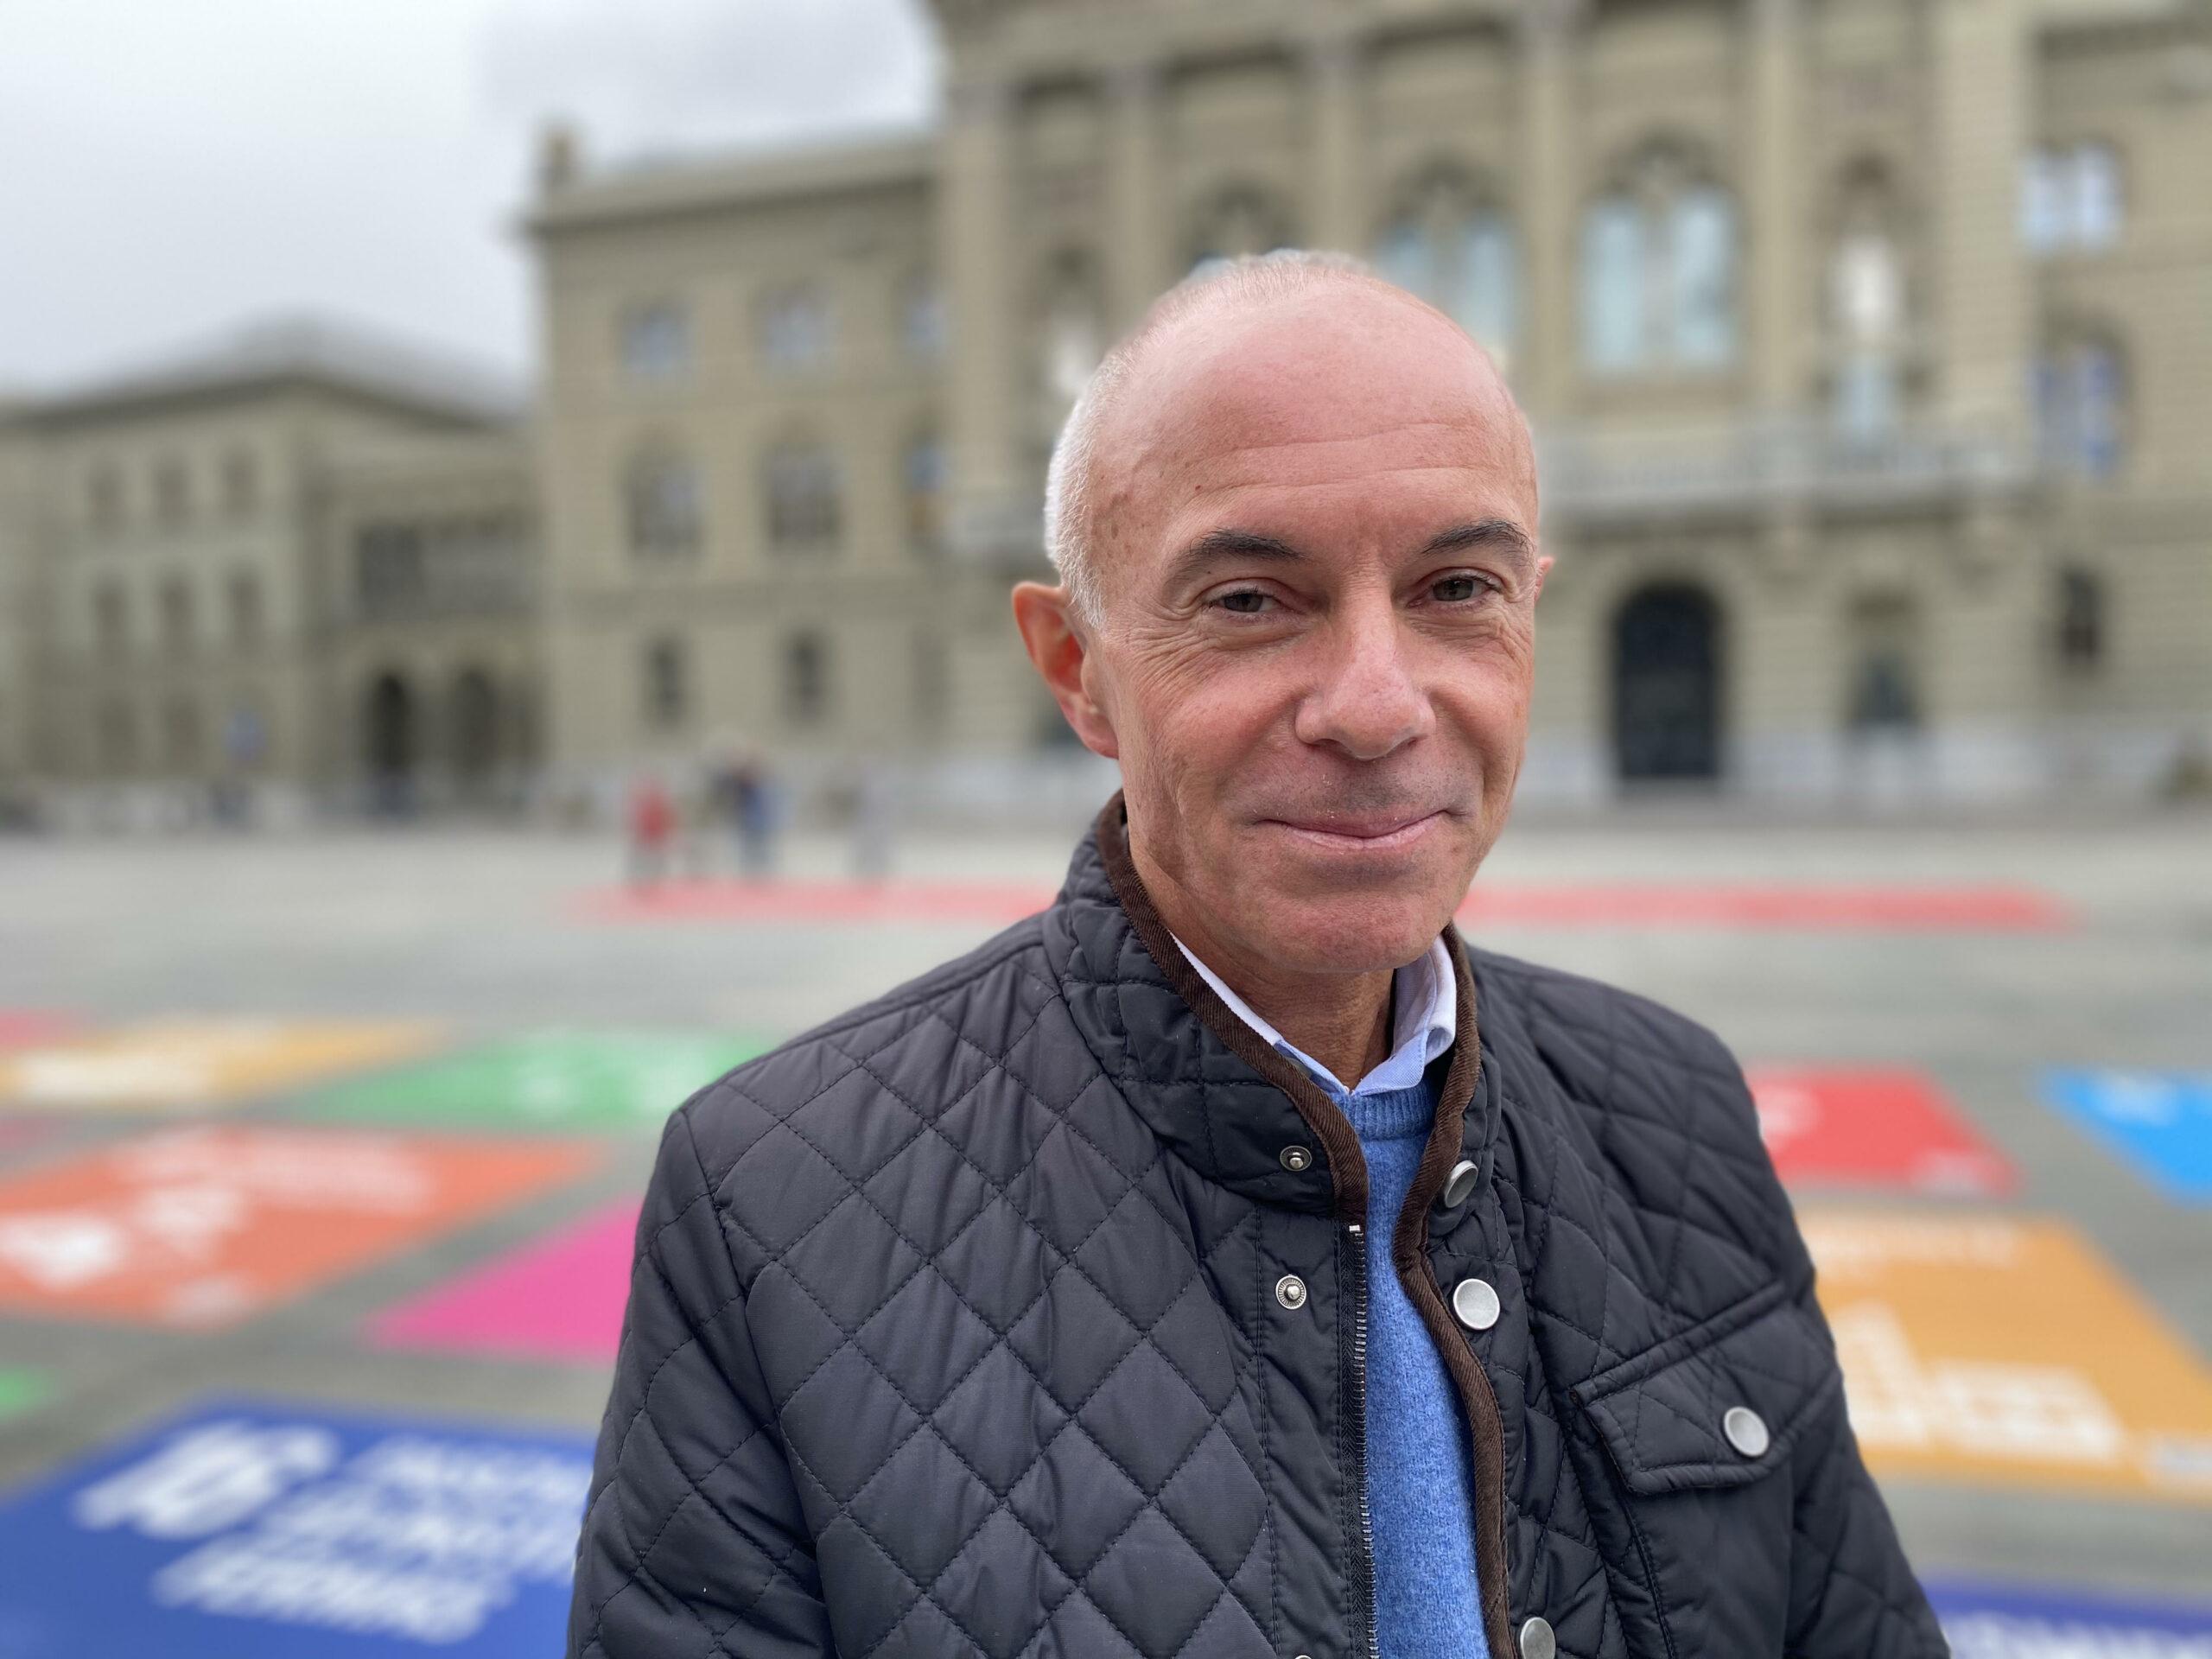 KOLUMNE: Nicolas Betticher, Adieu Pandemie?